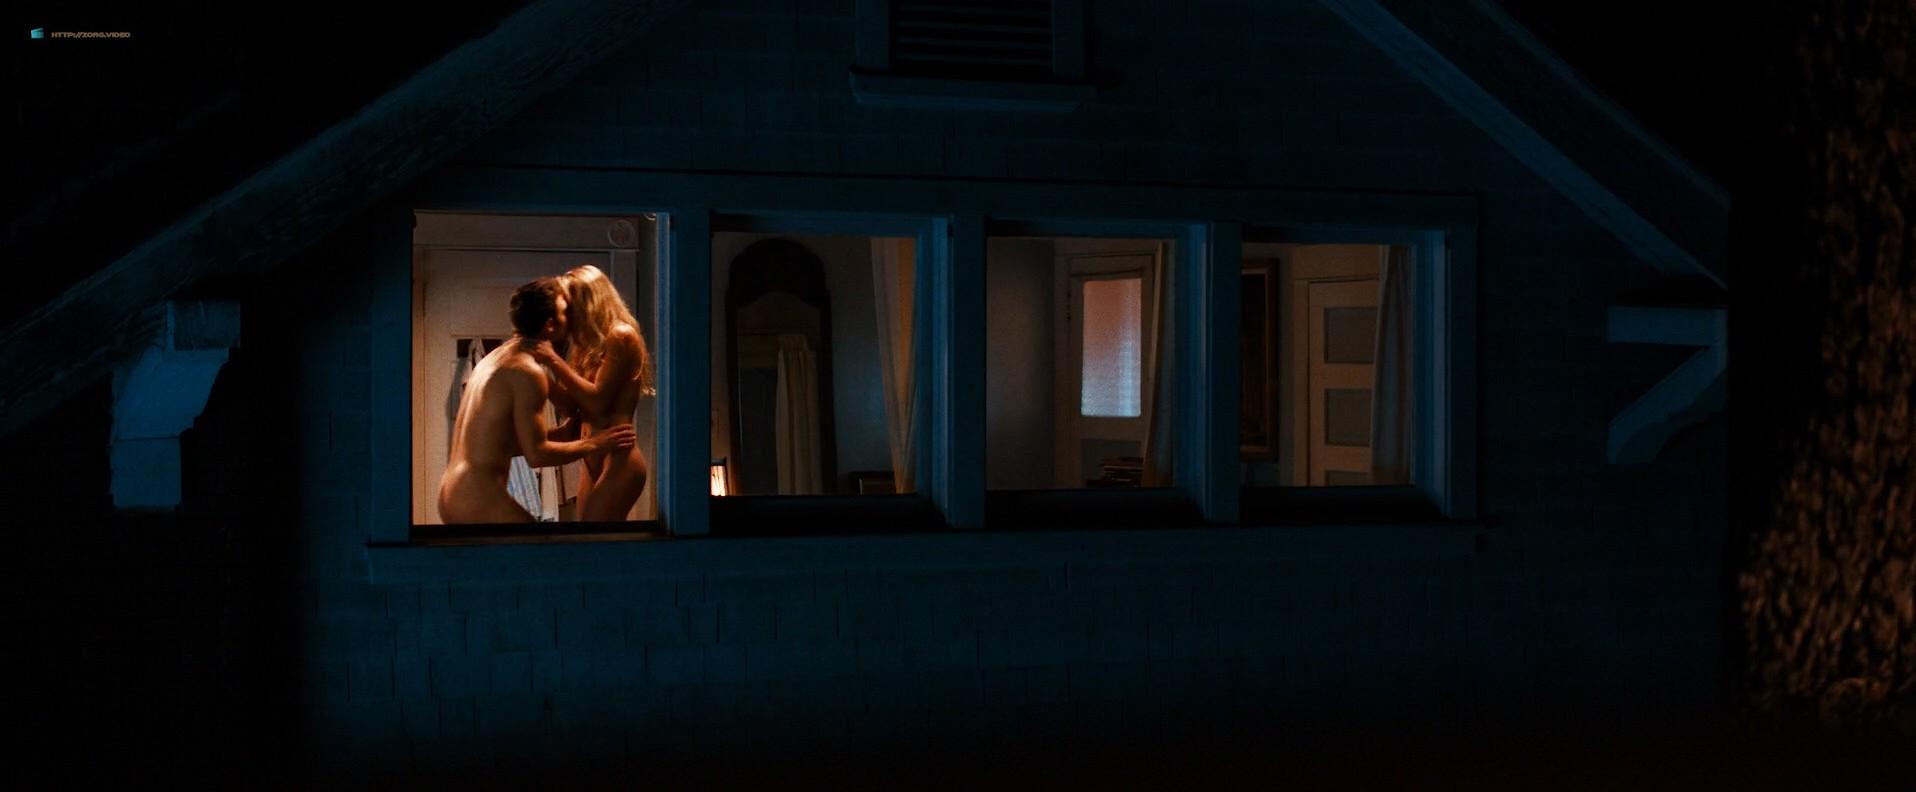 Jennifer Lopez hot sex scene and Lexi Atkins nude sex - The Boy Next Door (2015) HD 1080p (6)